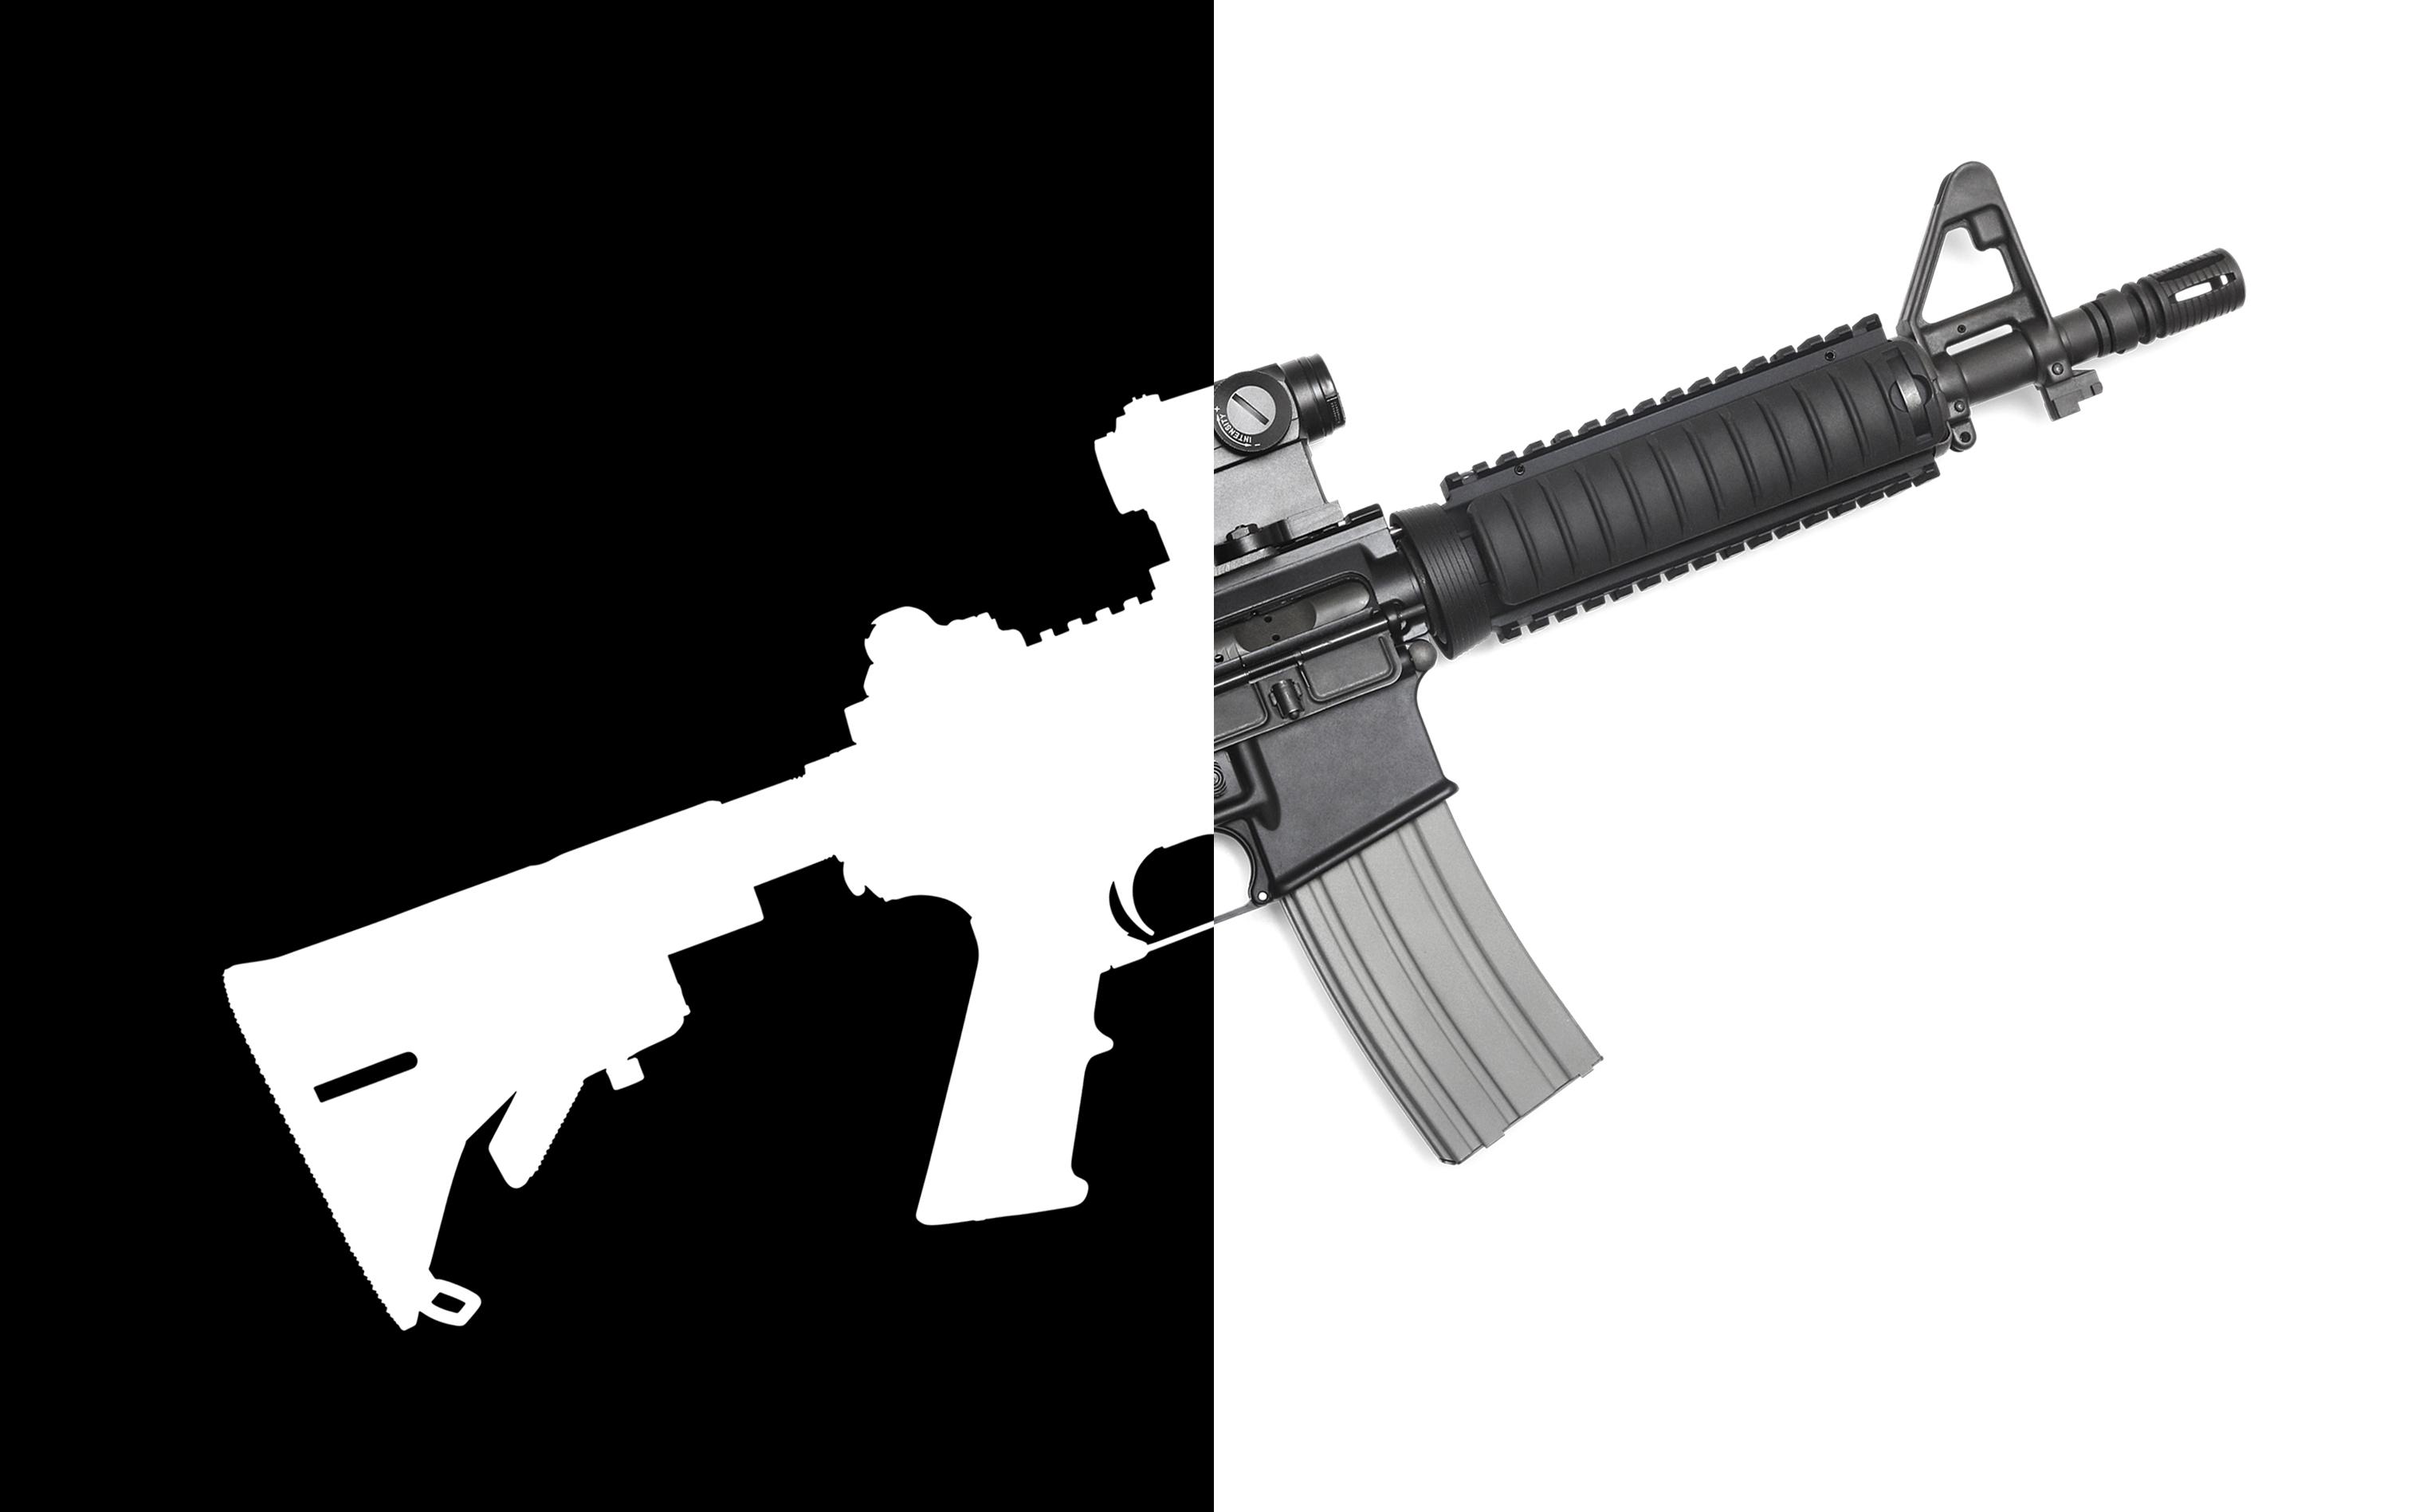 AR-15 Rifle Women/'s T-Shirt Right to Bear Arms 2nd Amendment Gun Rights Shirt